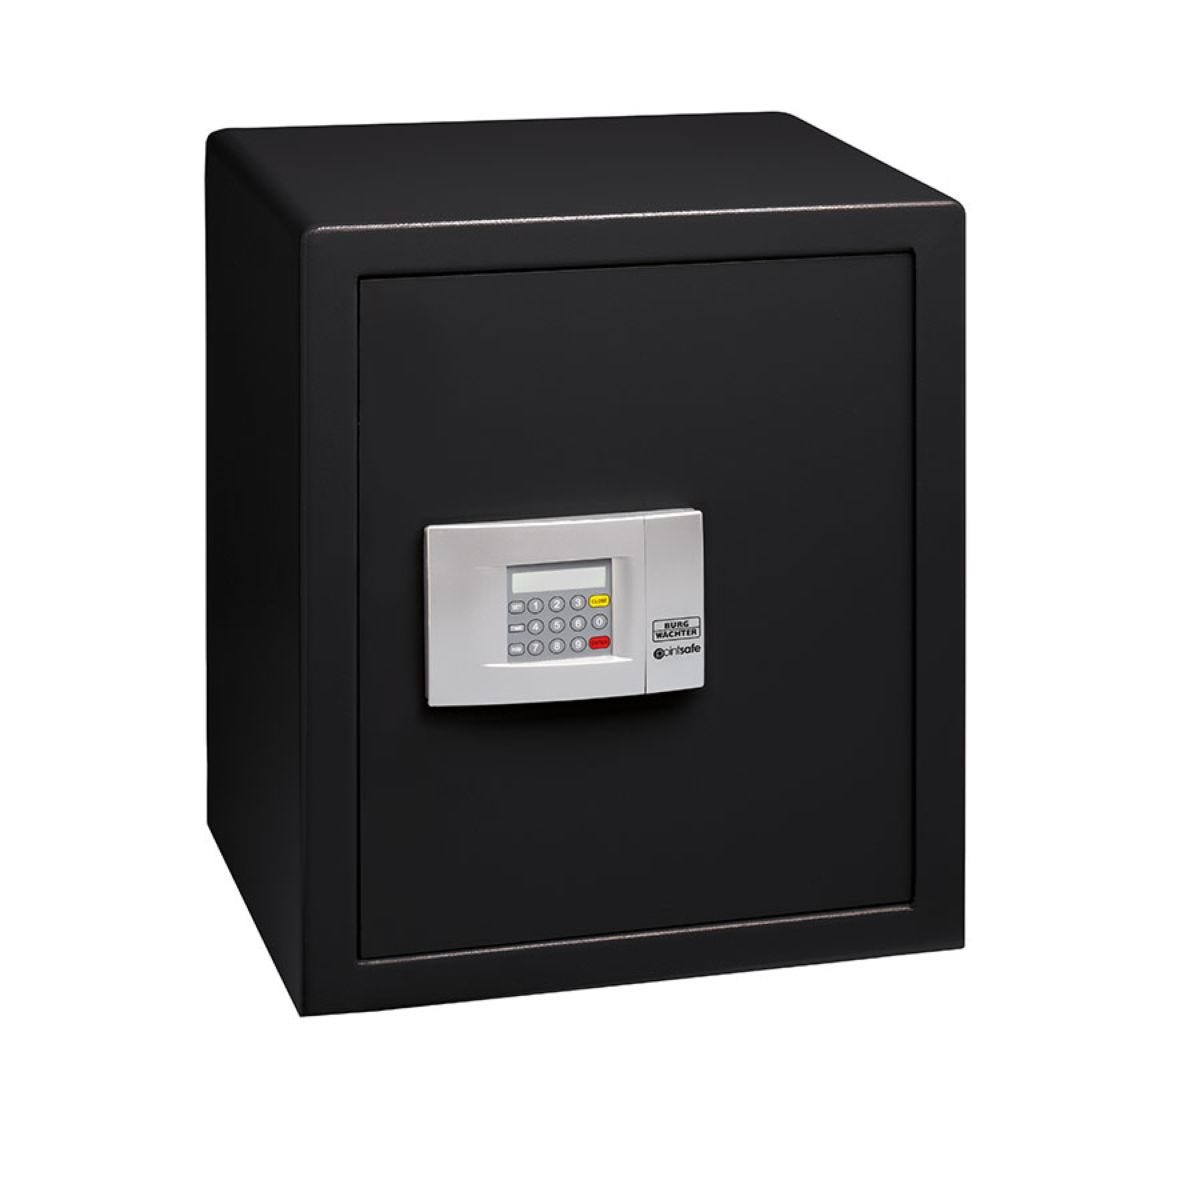 Burg-Wachter PointSafe Electronic Safe – 57.9L